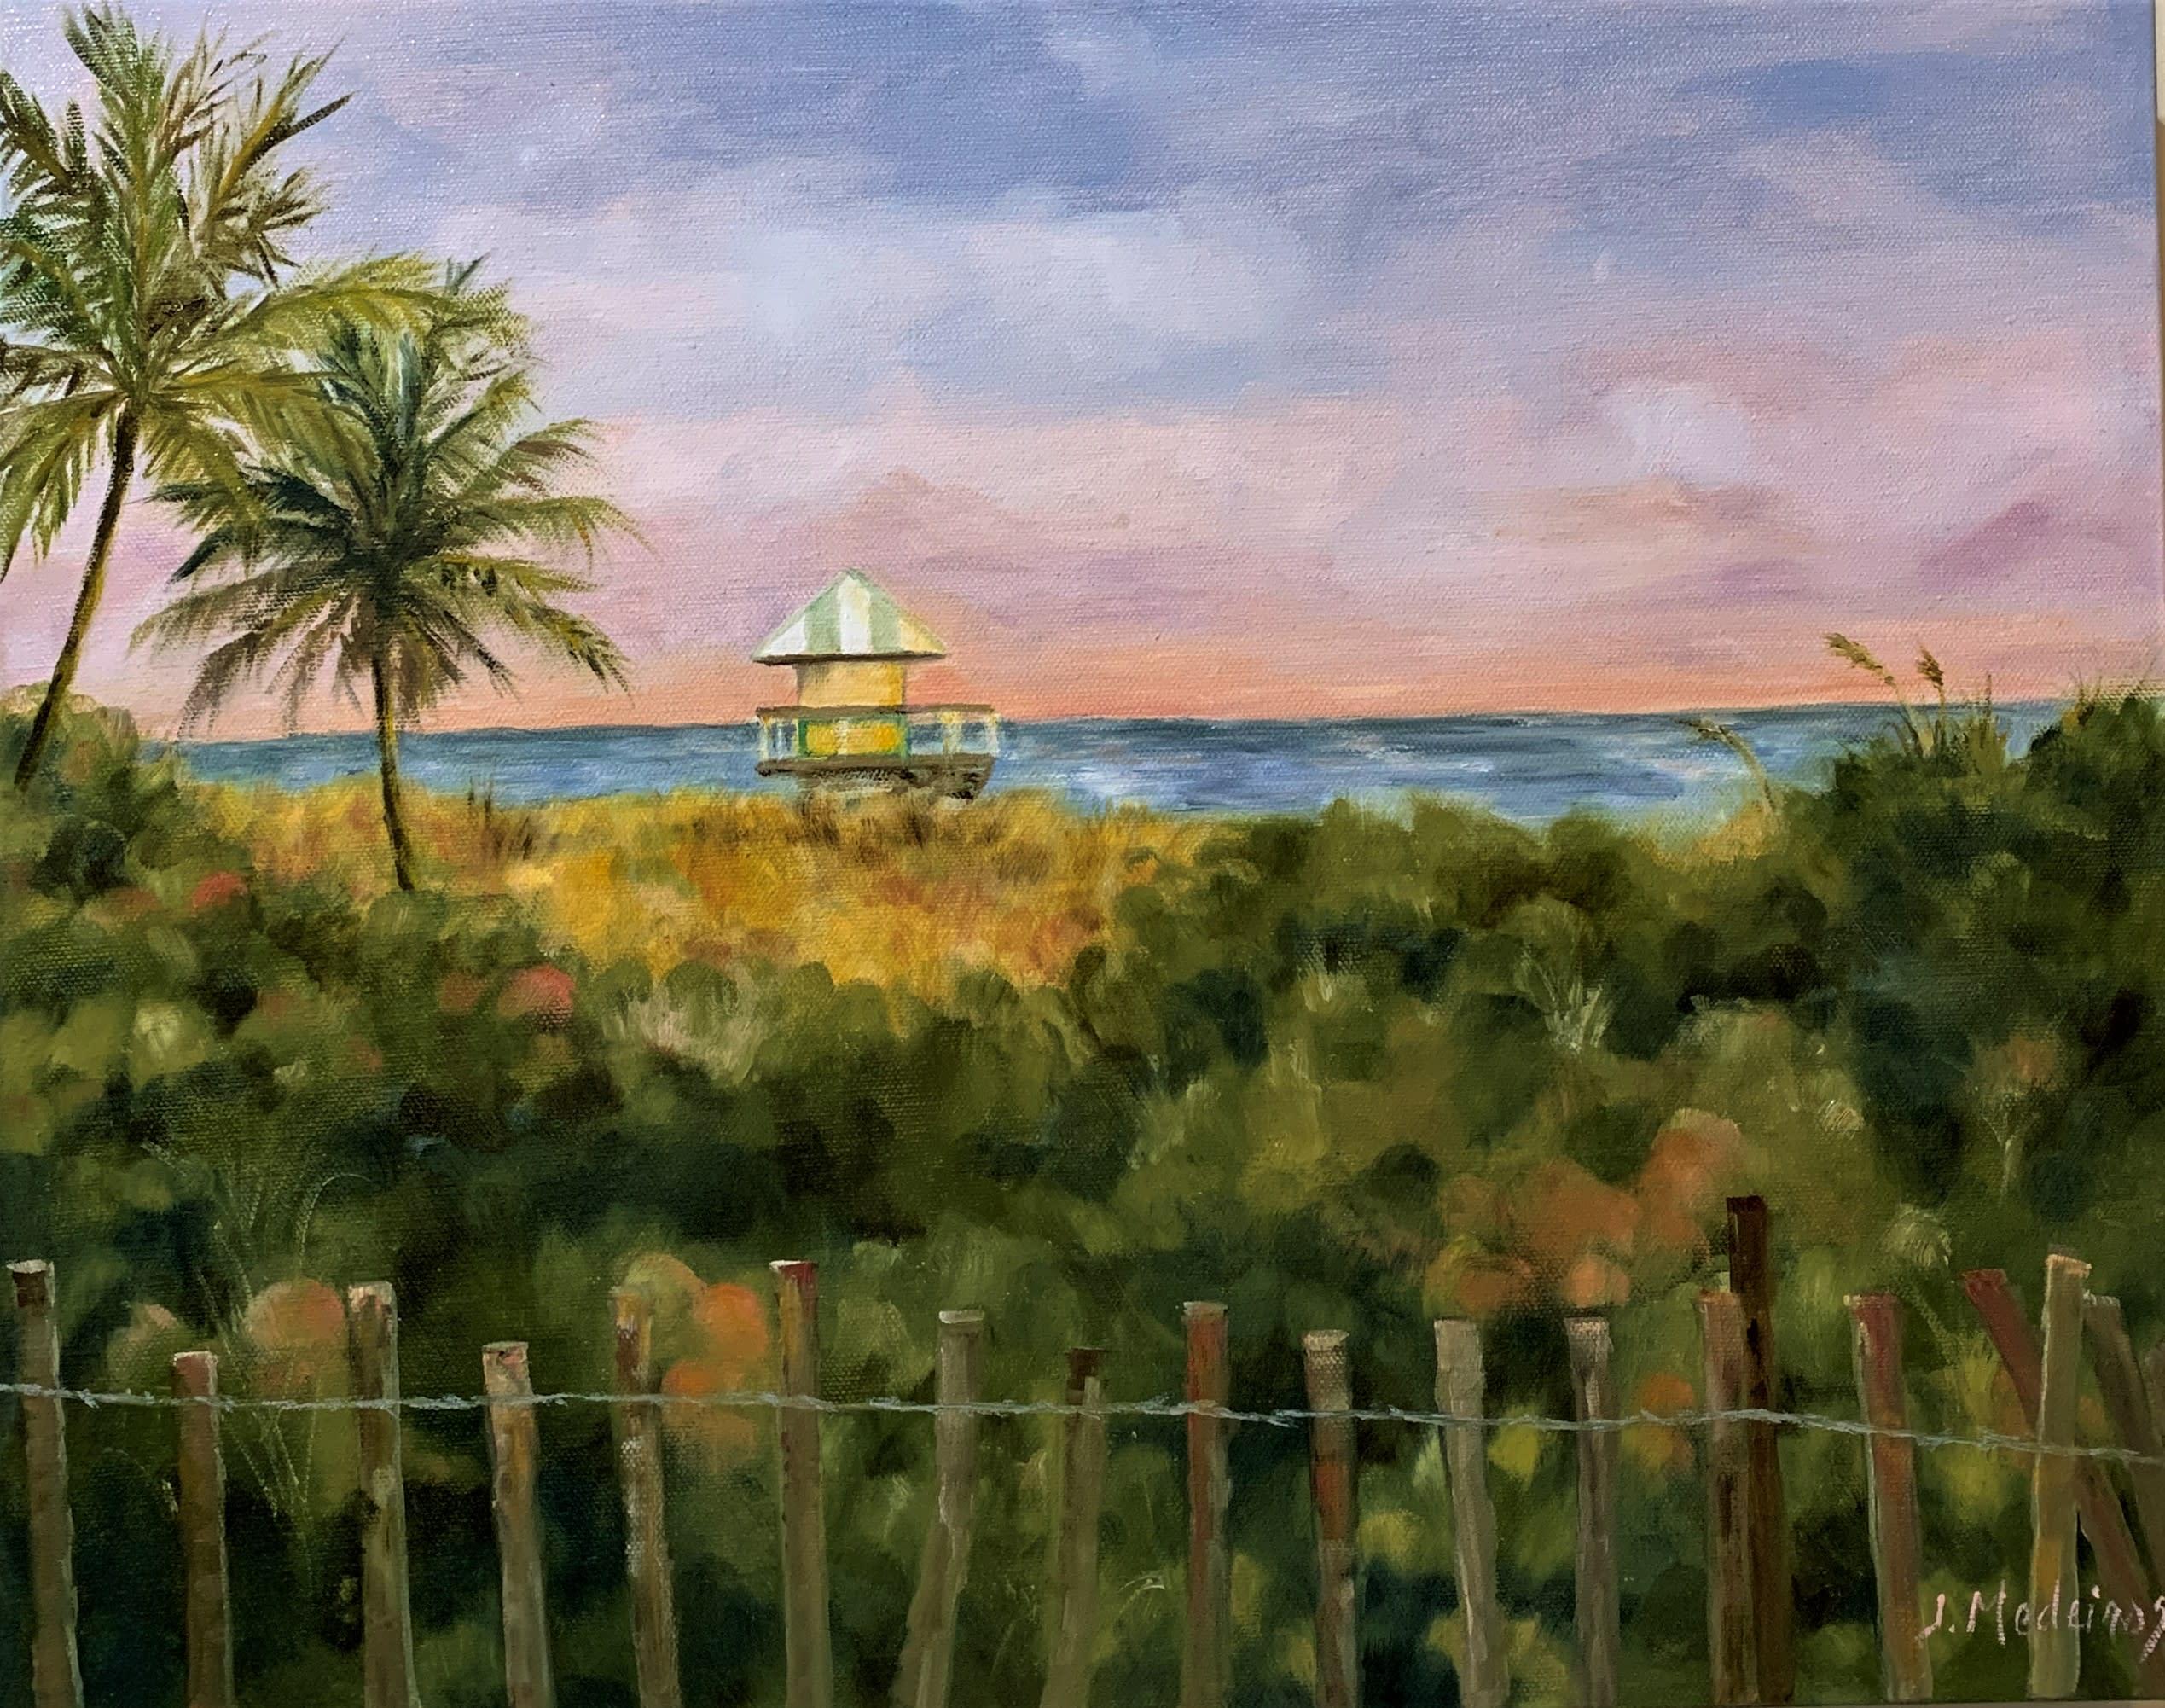 Dusk on delray beach ls1la9